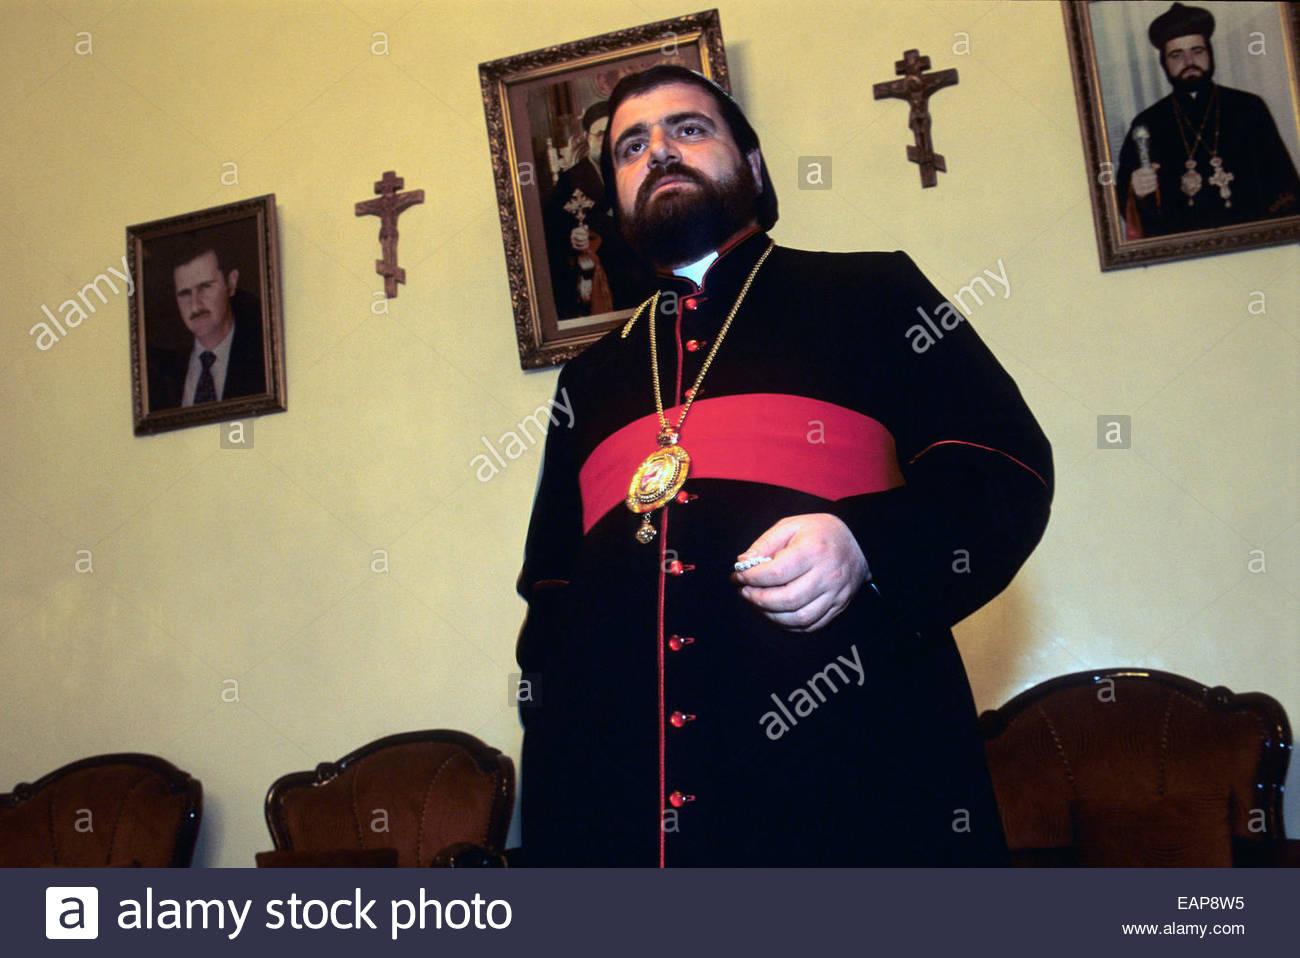 Syriac orthodox eveque Selvanos Boutros Al Nemeh at Homs, Syria. - Stock Image